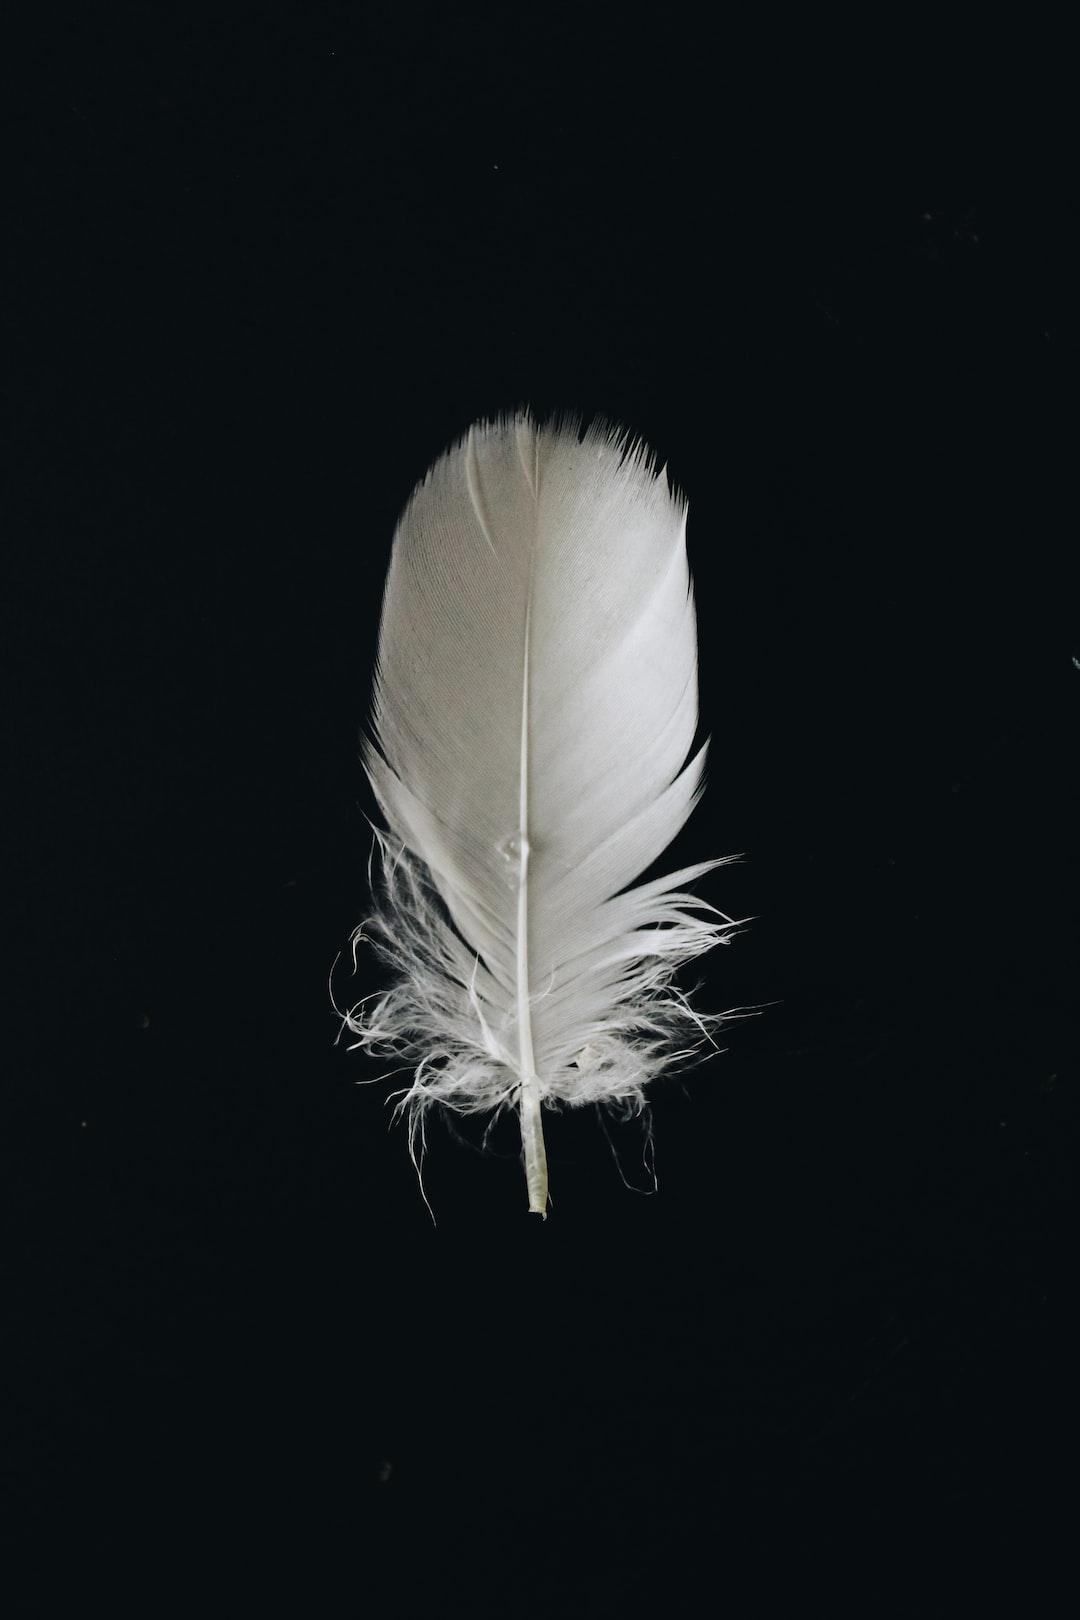 White feather on black background